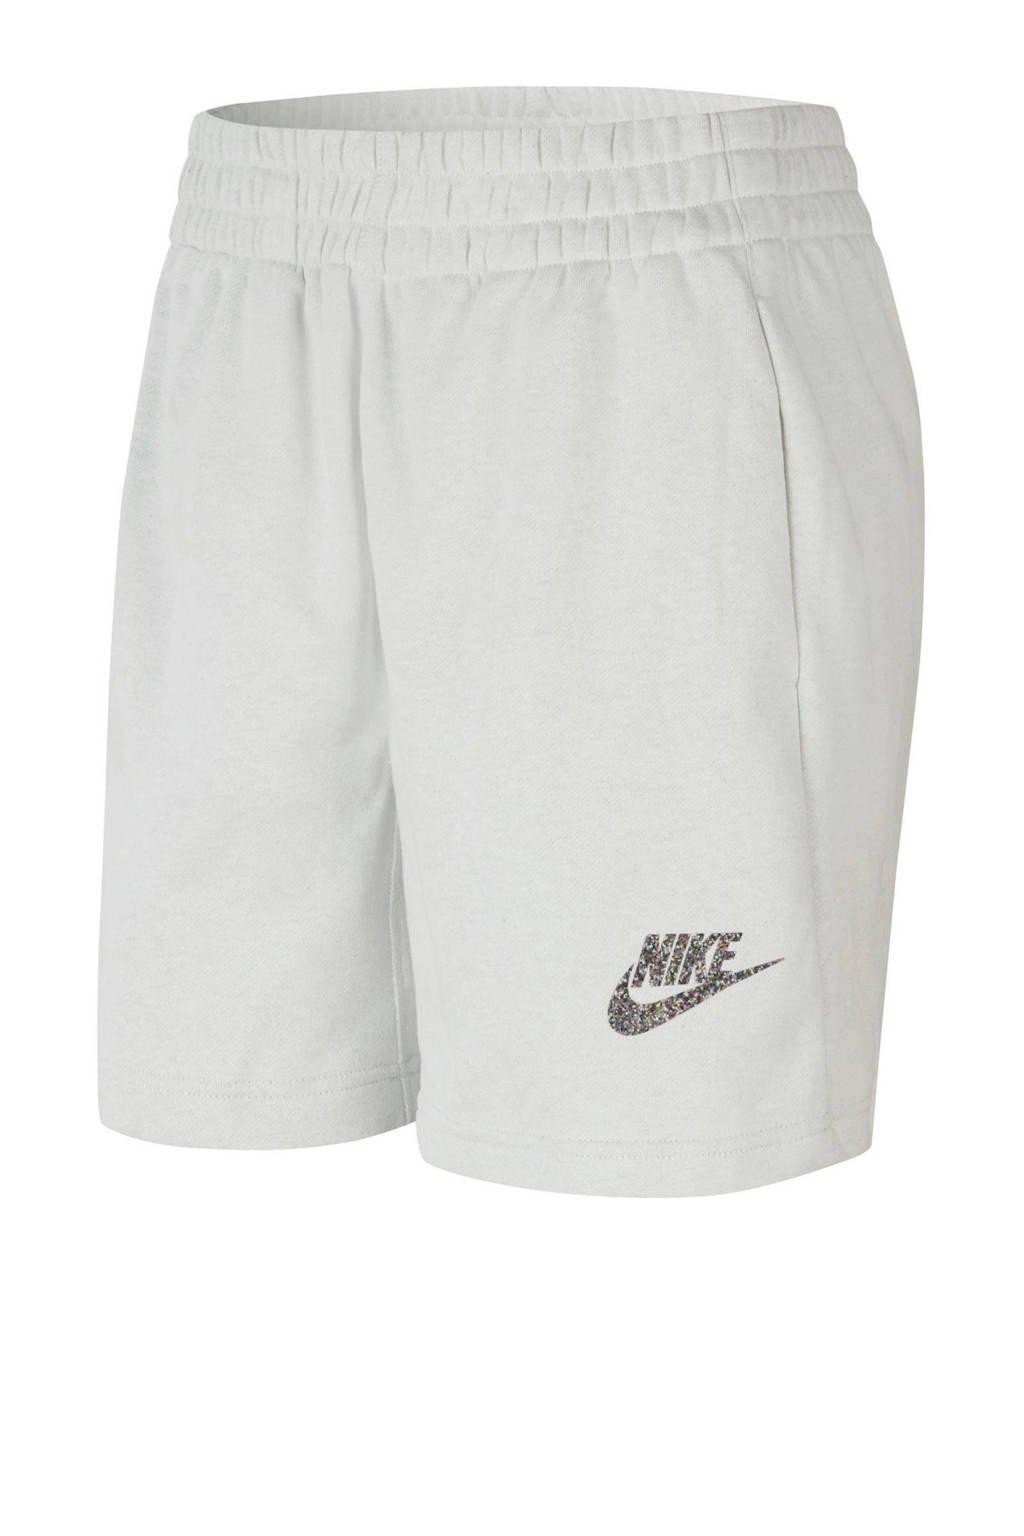 Nike sweatshort lichtgrijs, Lichtgrijs